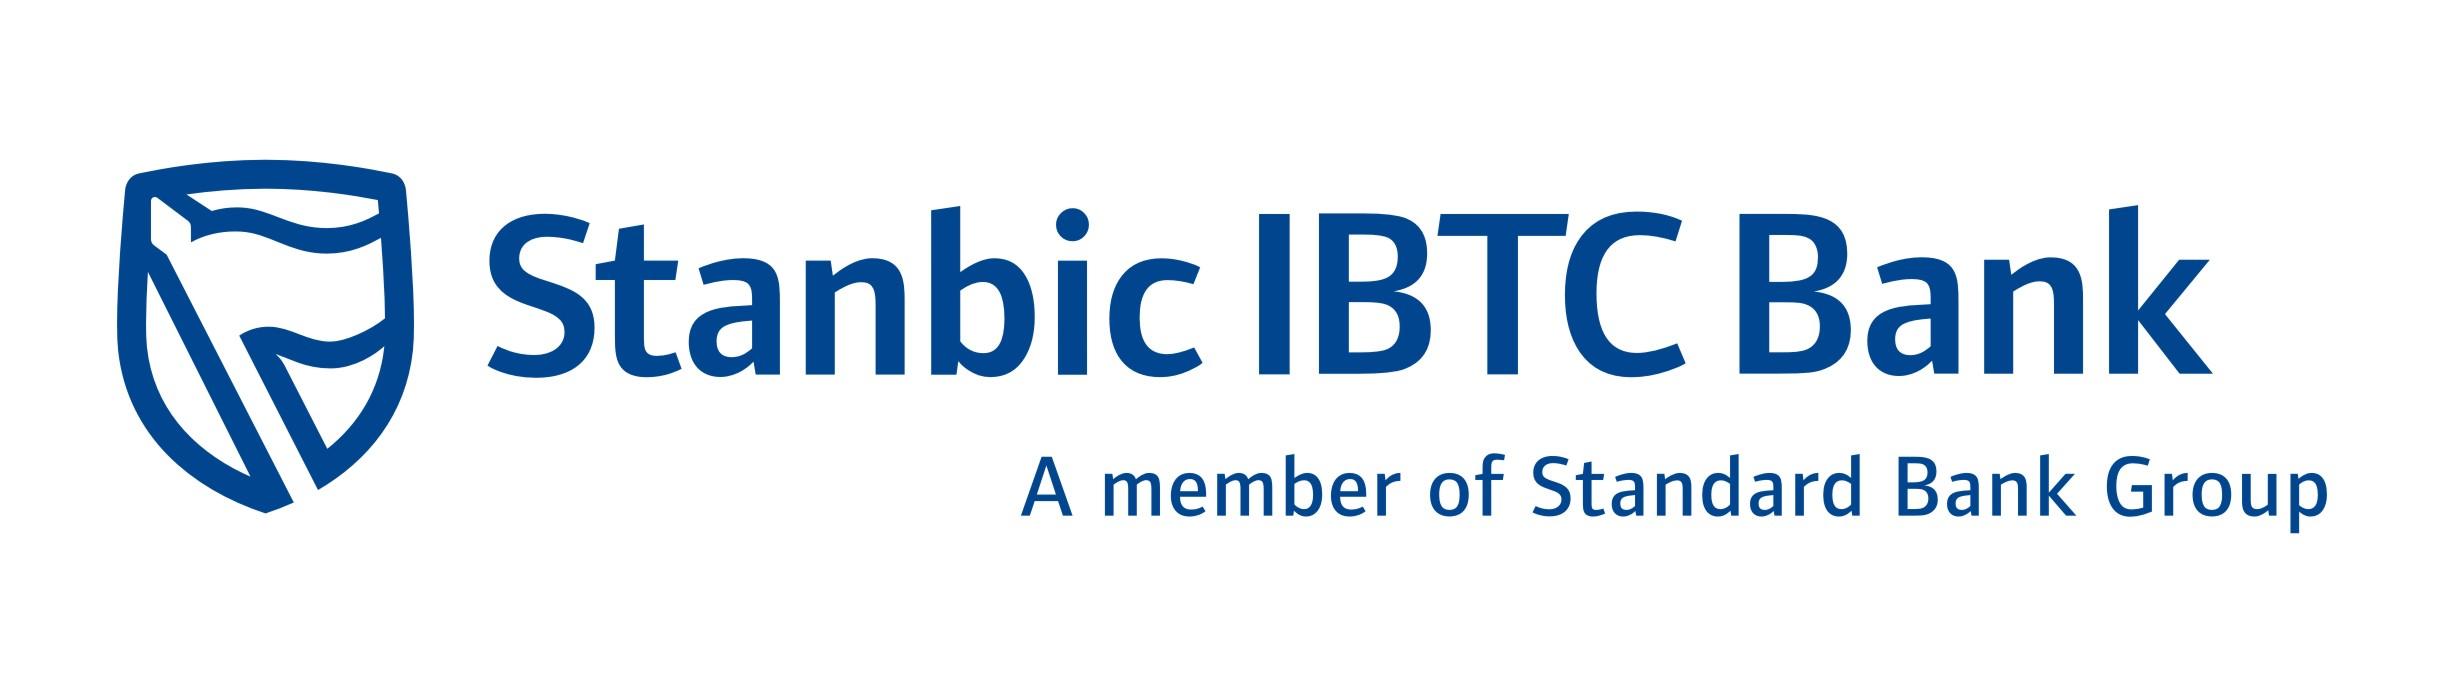 Stanbic IBTC Bank Recruitment for Graduates